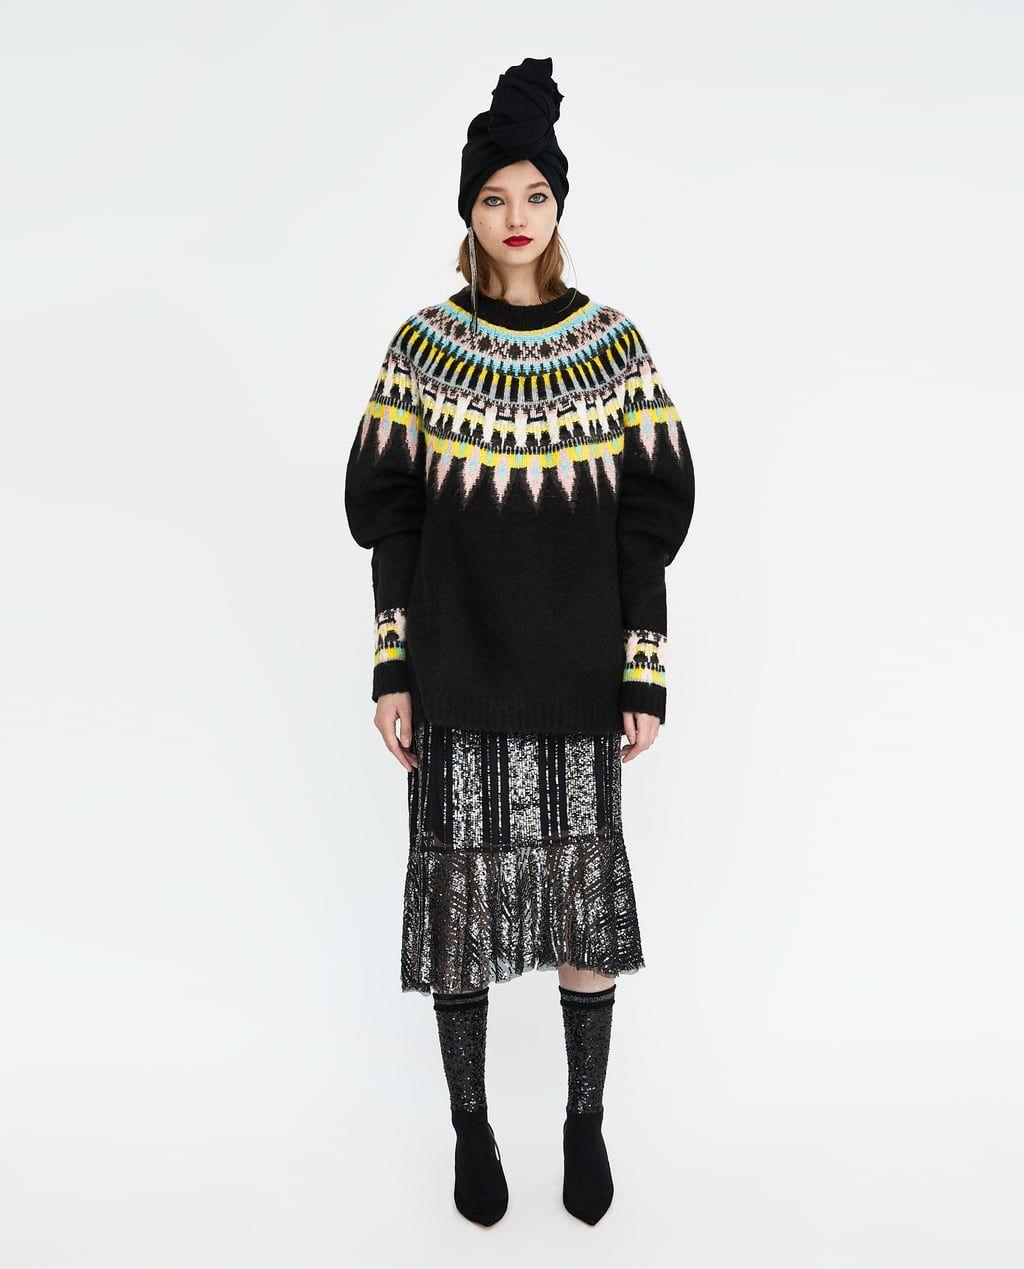 a1d1a4af74d OVERSIZED JACQUARD SWEATER-DRESS TIME-WOMAN